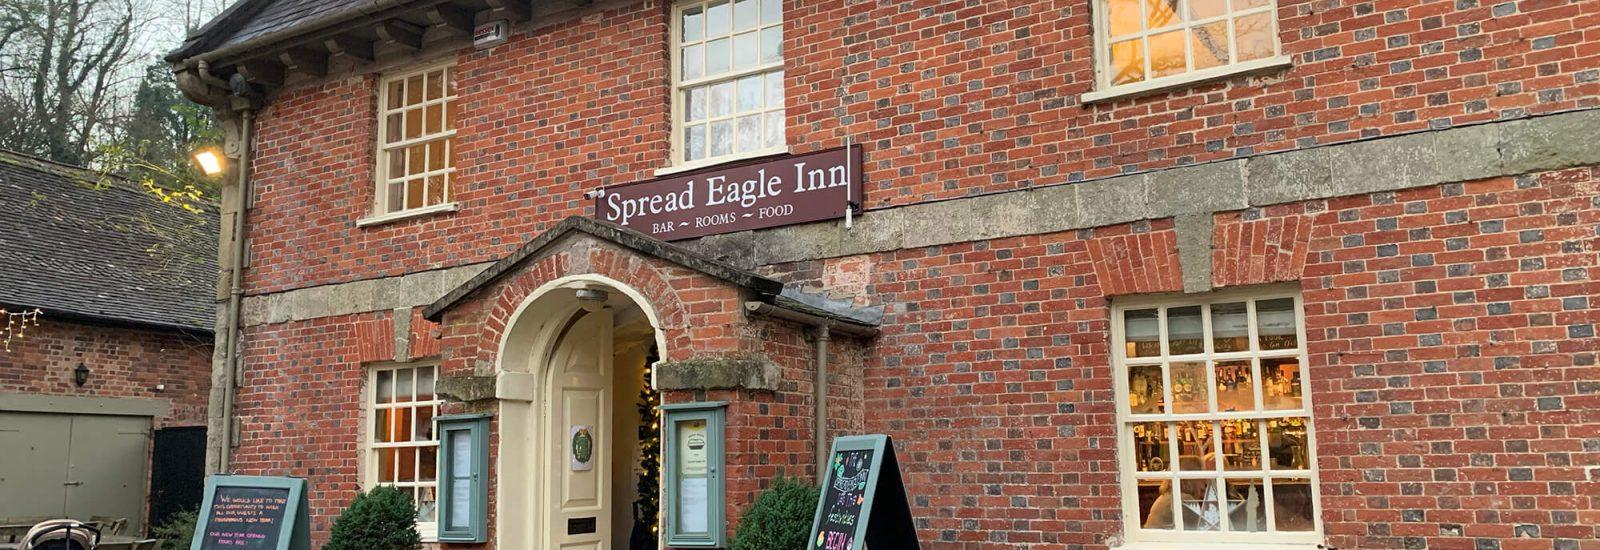 Image of Spread Eagle Inn